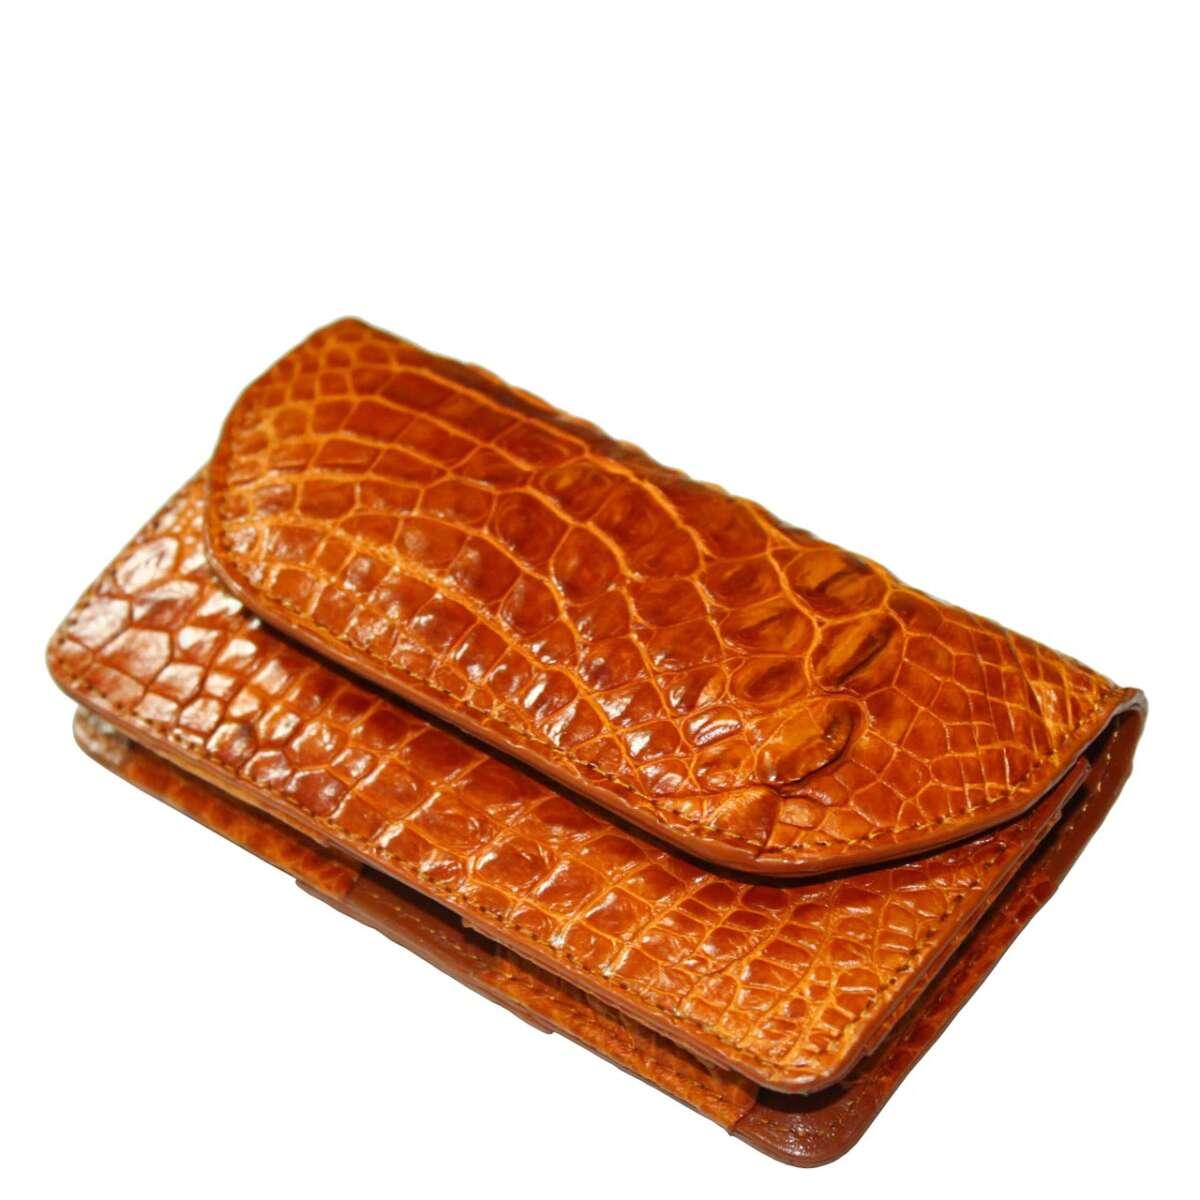 Чехол для Iphone 6/7/8 из кожи крокодила S1001a